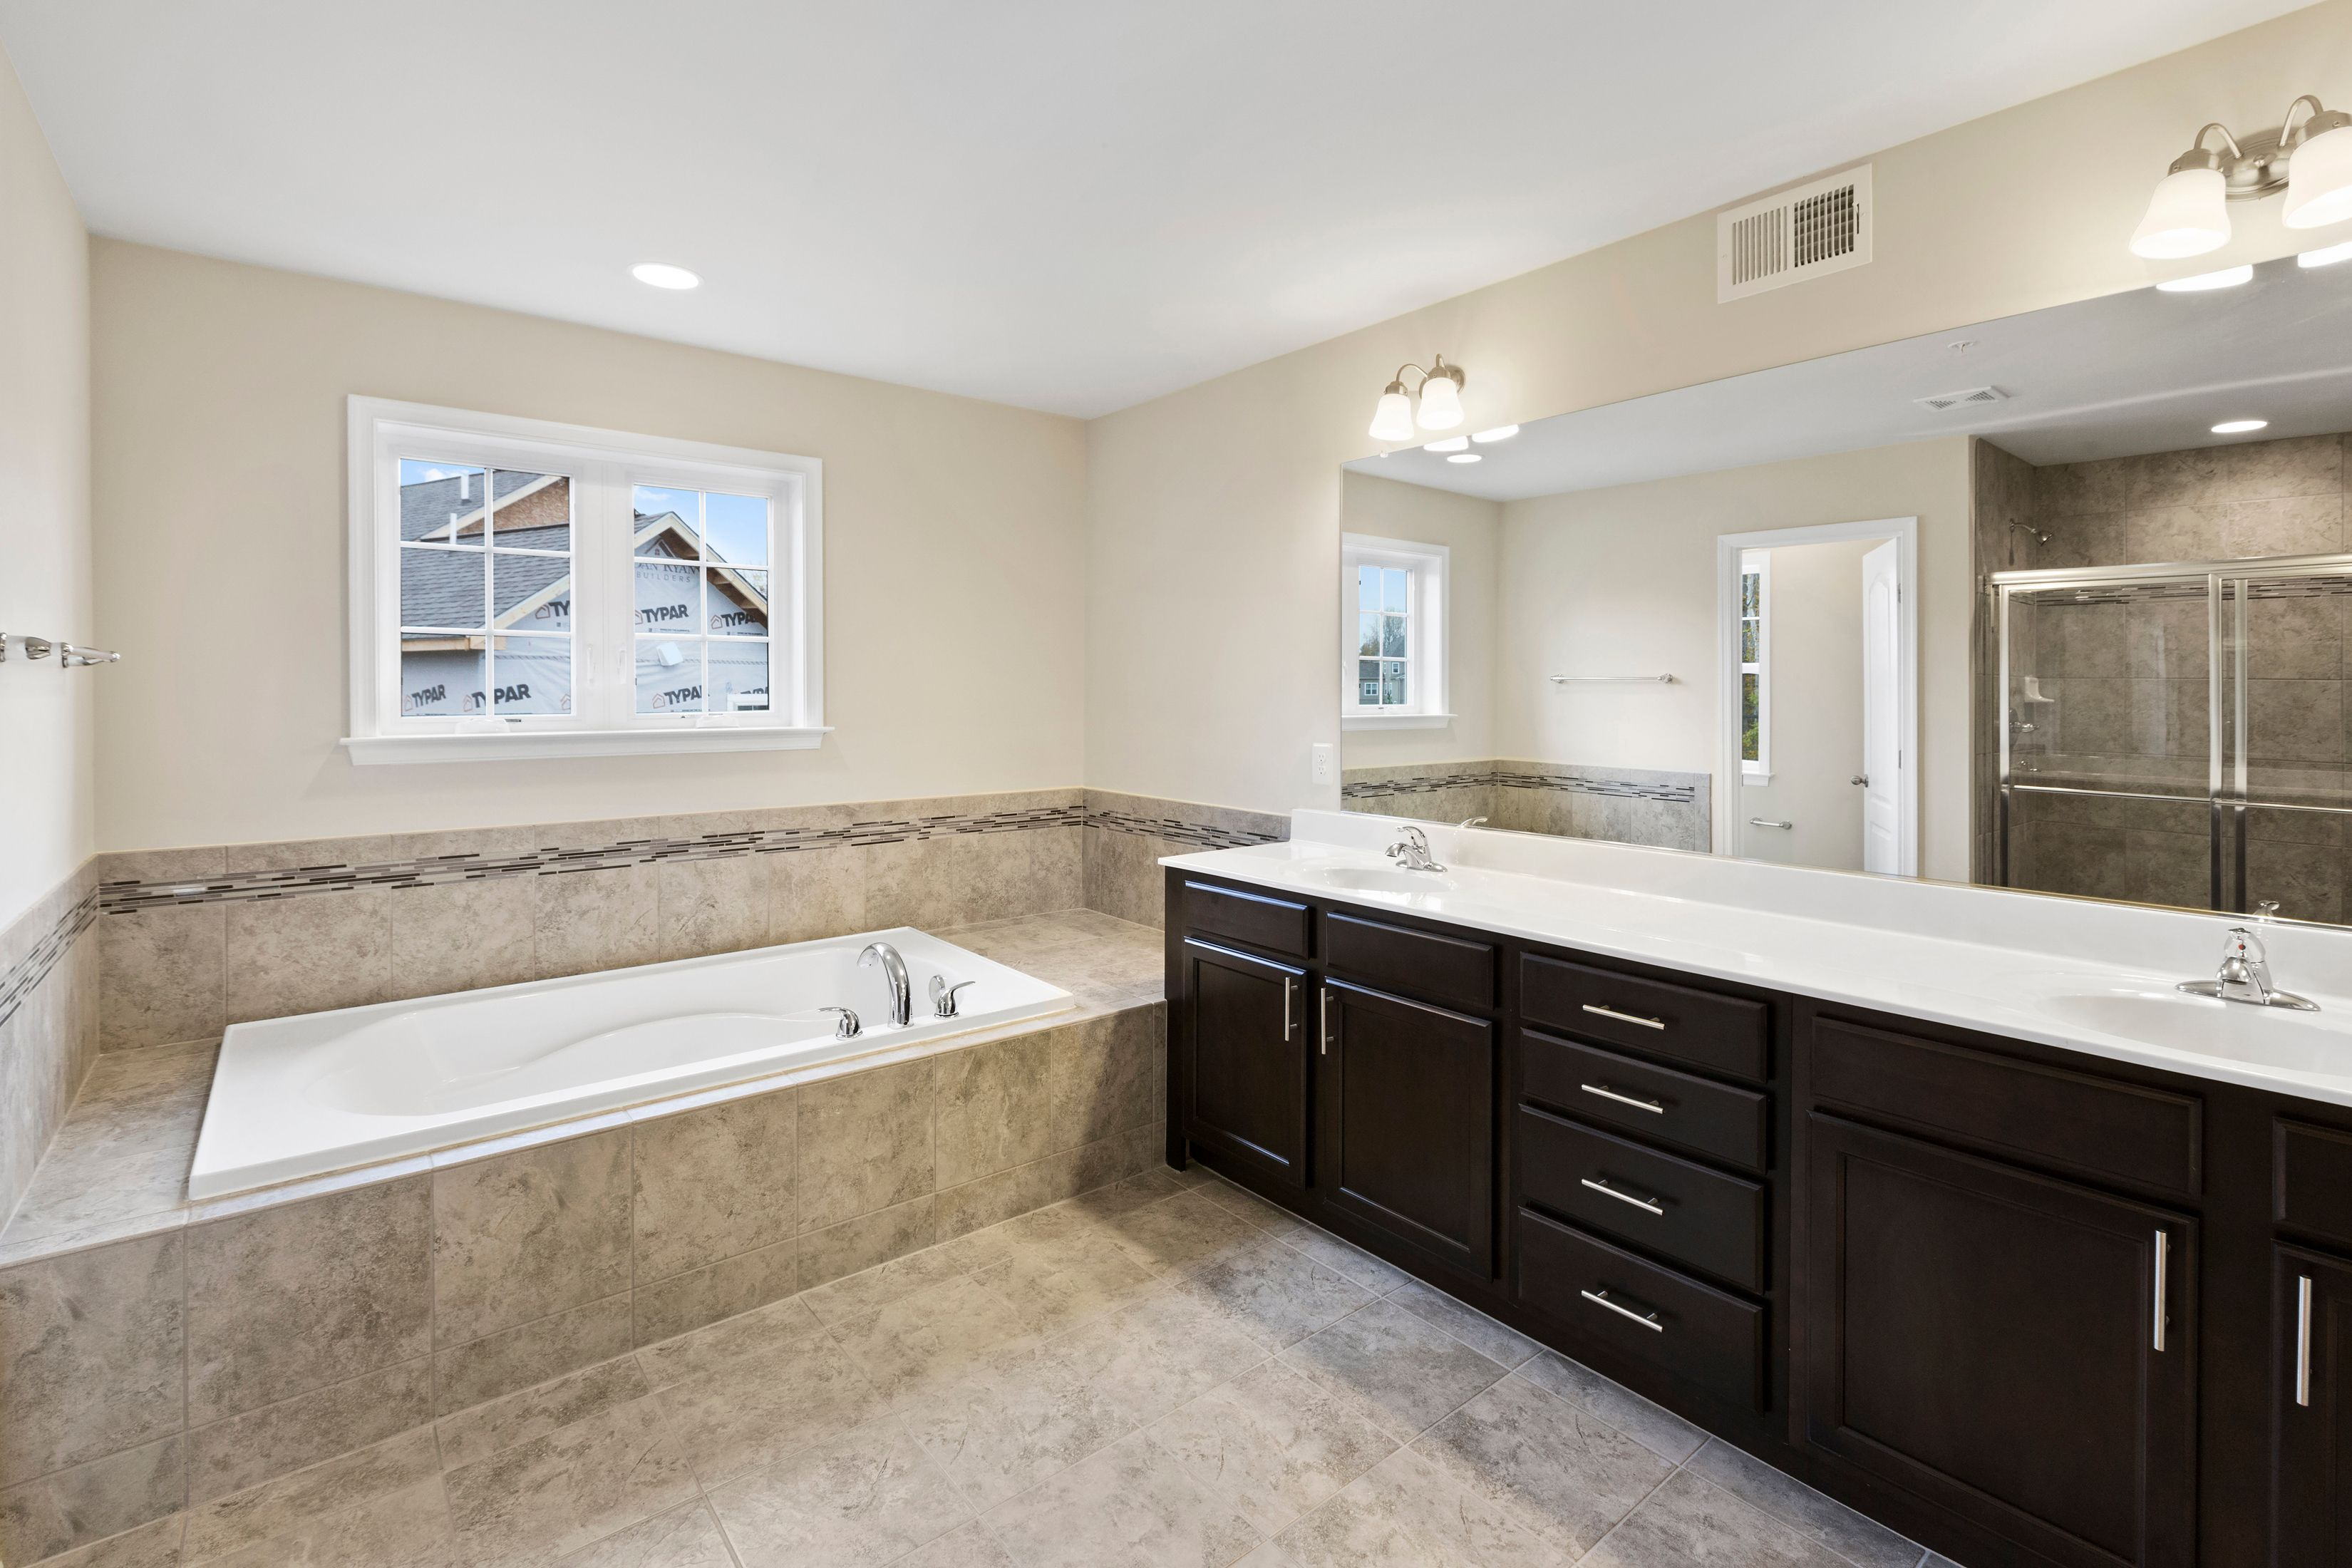 Bathroom featured in the Belmont II By Dan Ryan Builders in Hagerstown, MD